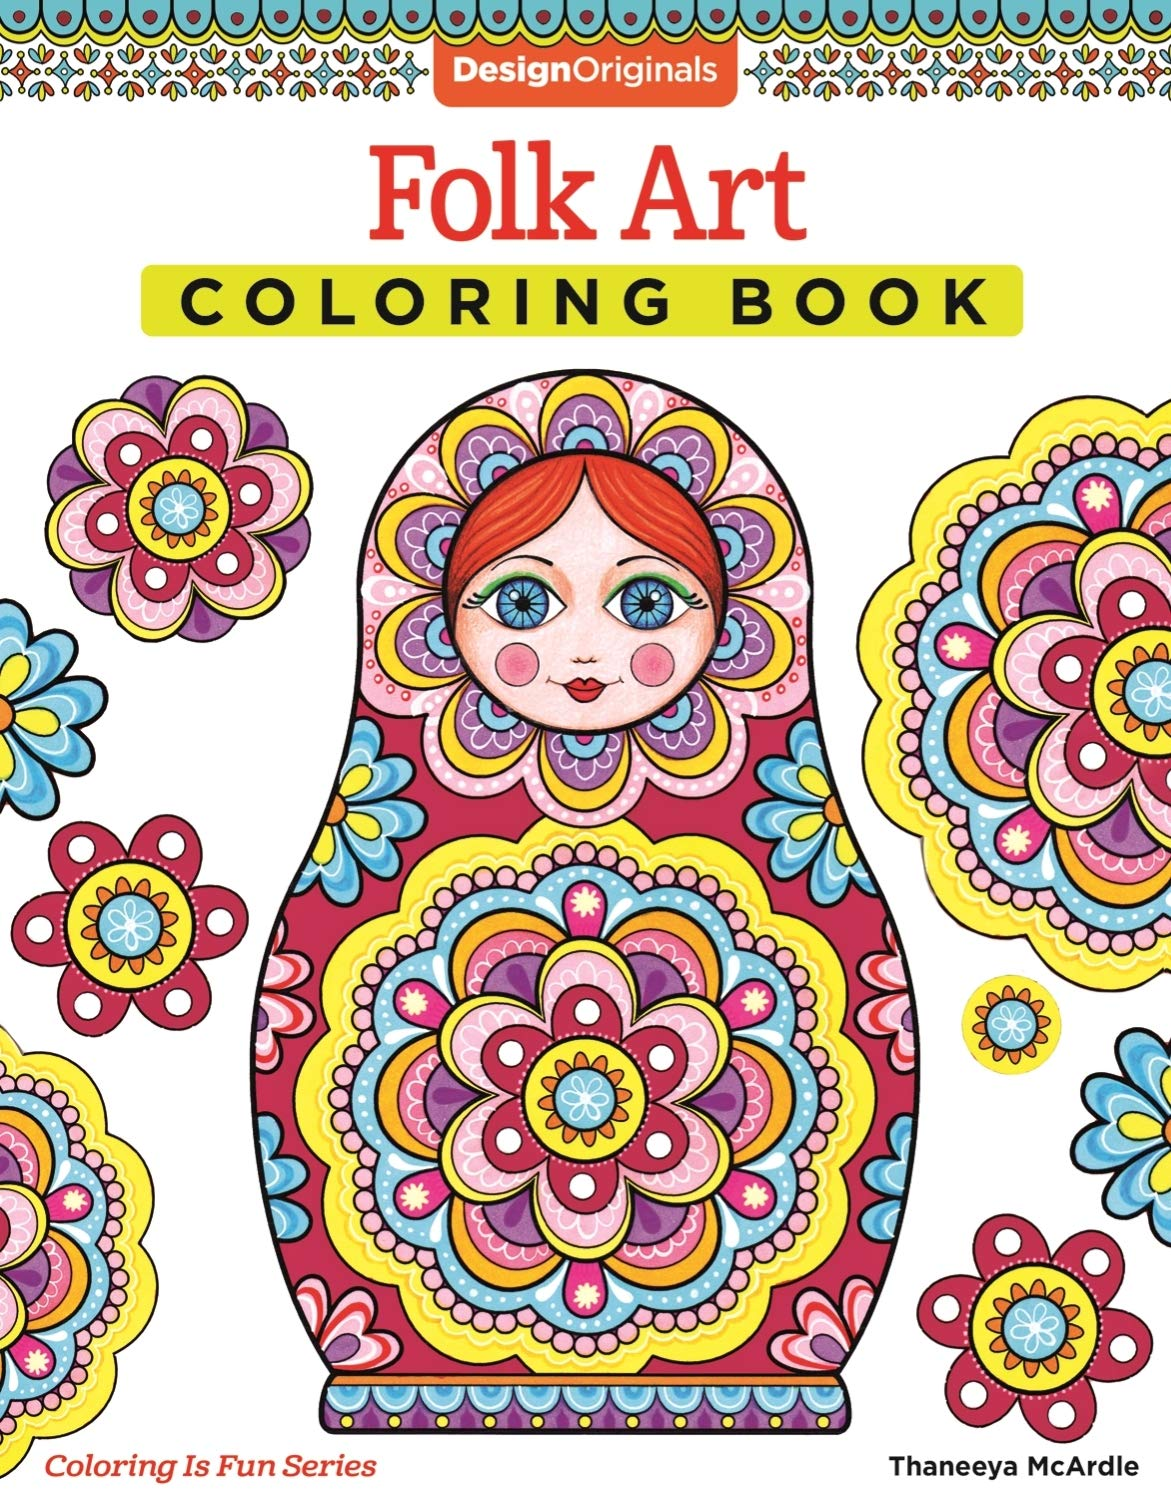 Folk Art Coloring Book Design Originals Coloring Is Fun Thaneeya Mcardle 9781574219593 Books